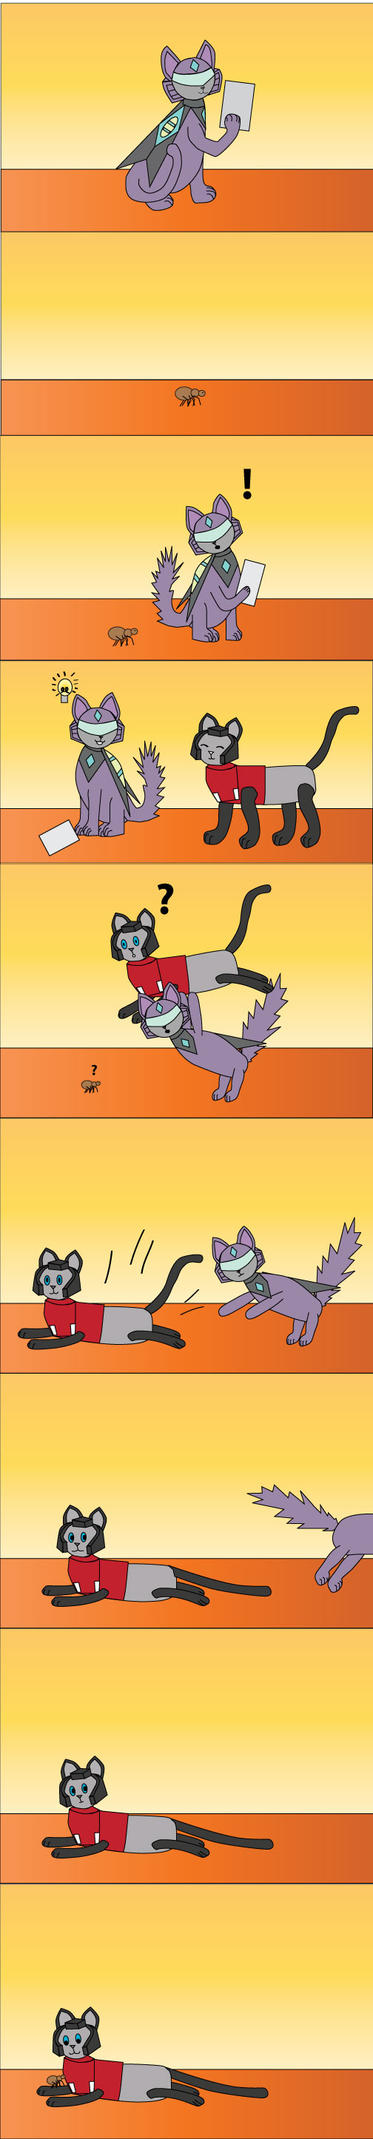 Blitzangel comic by srg1